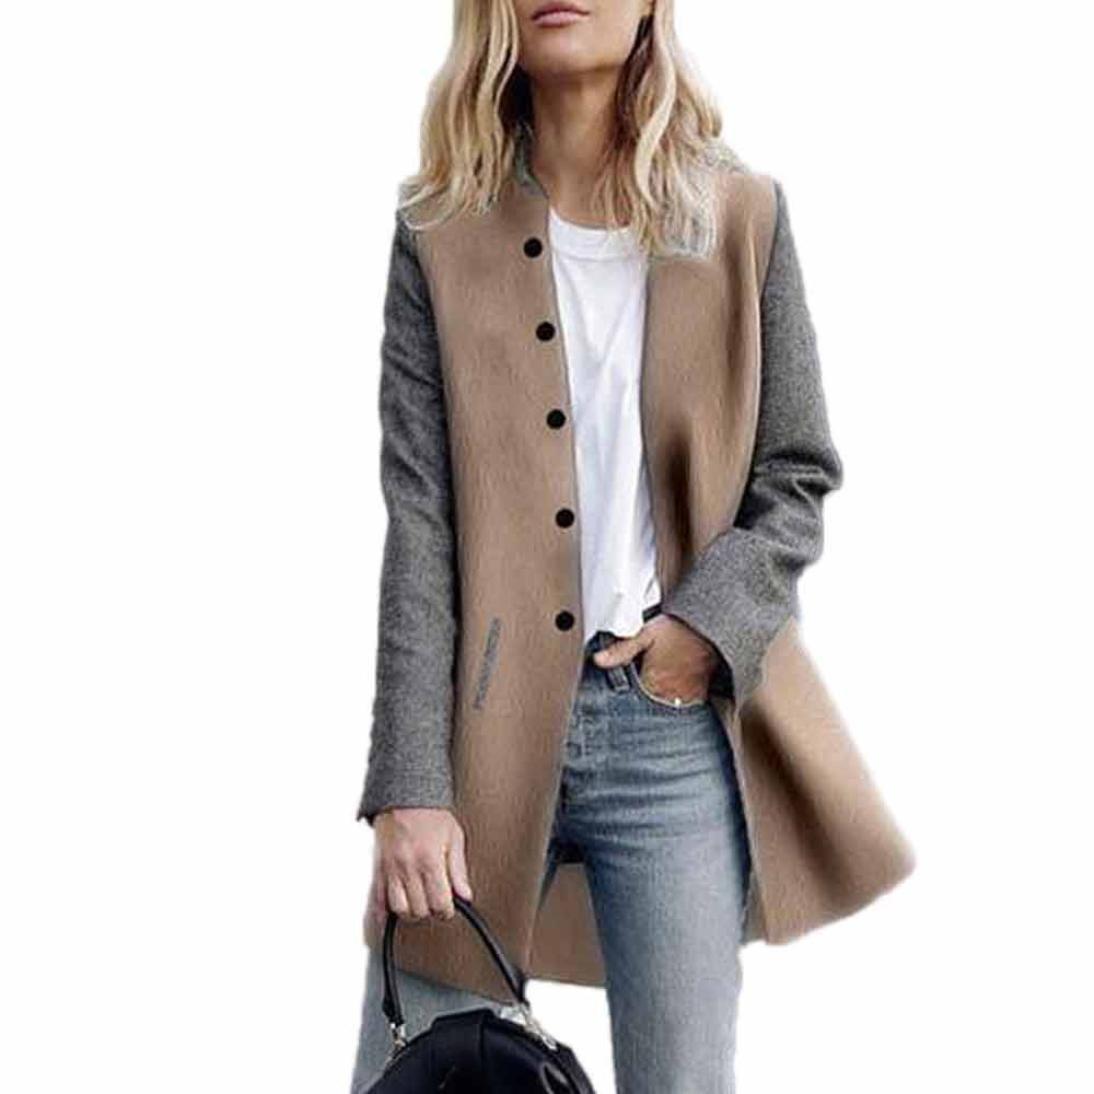 f95fda671 ManxiVoo Womens Coat Lady Casual Long Sleeve Cardigan Jacket Coat Patchwork  Jumper Knitwear